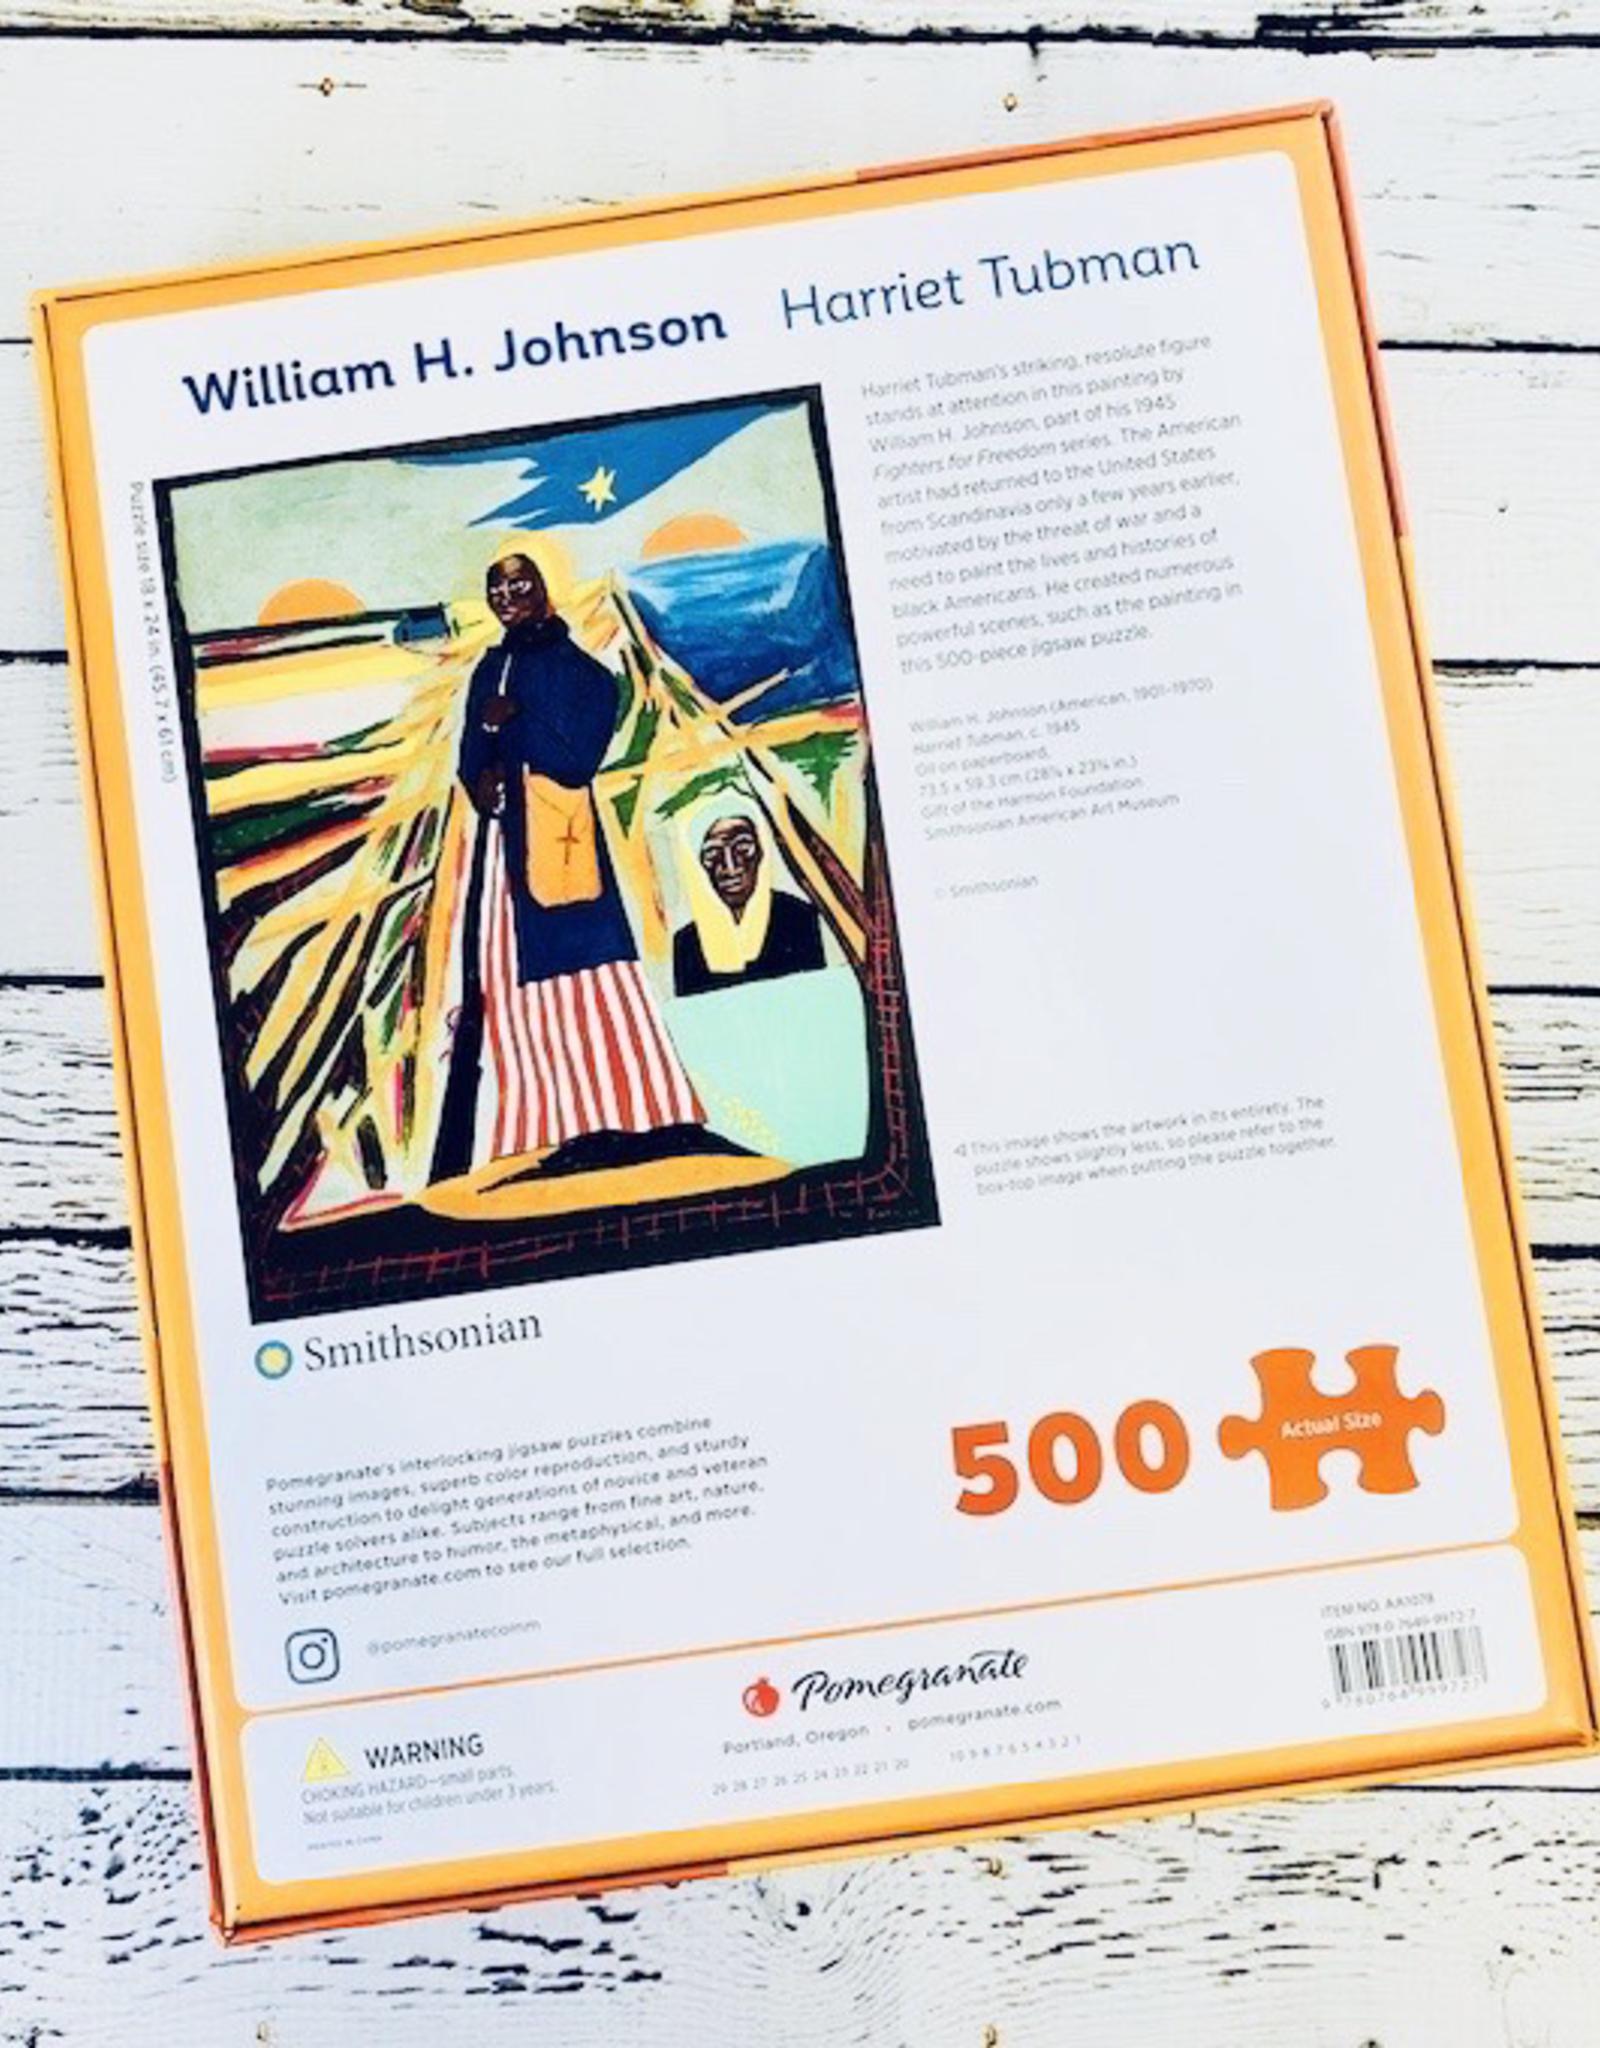 POMEGRANATE William H. Johnson: Harriet Tubman 500-Piece Jigsaw Puzzle